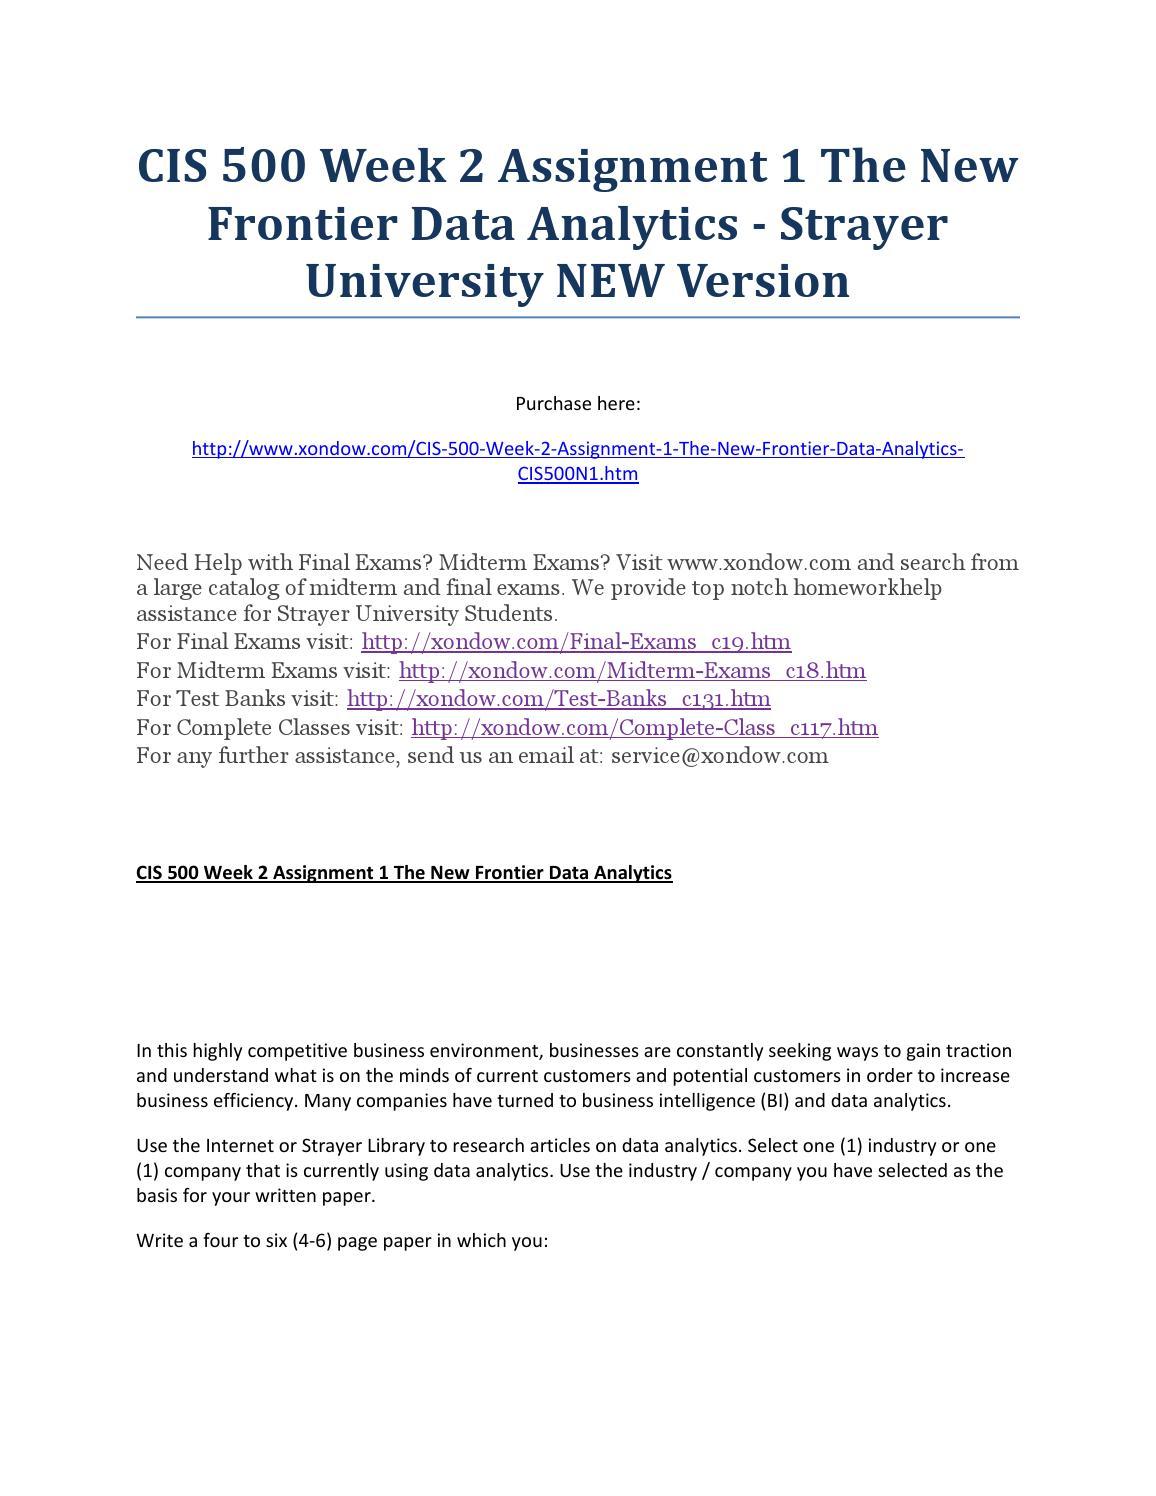 CIS 500 Assignment 1 Predictive Policing (Strayer Course)